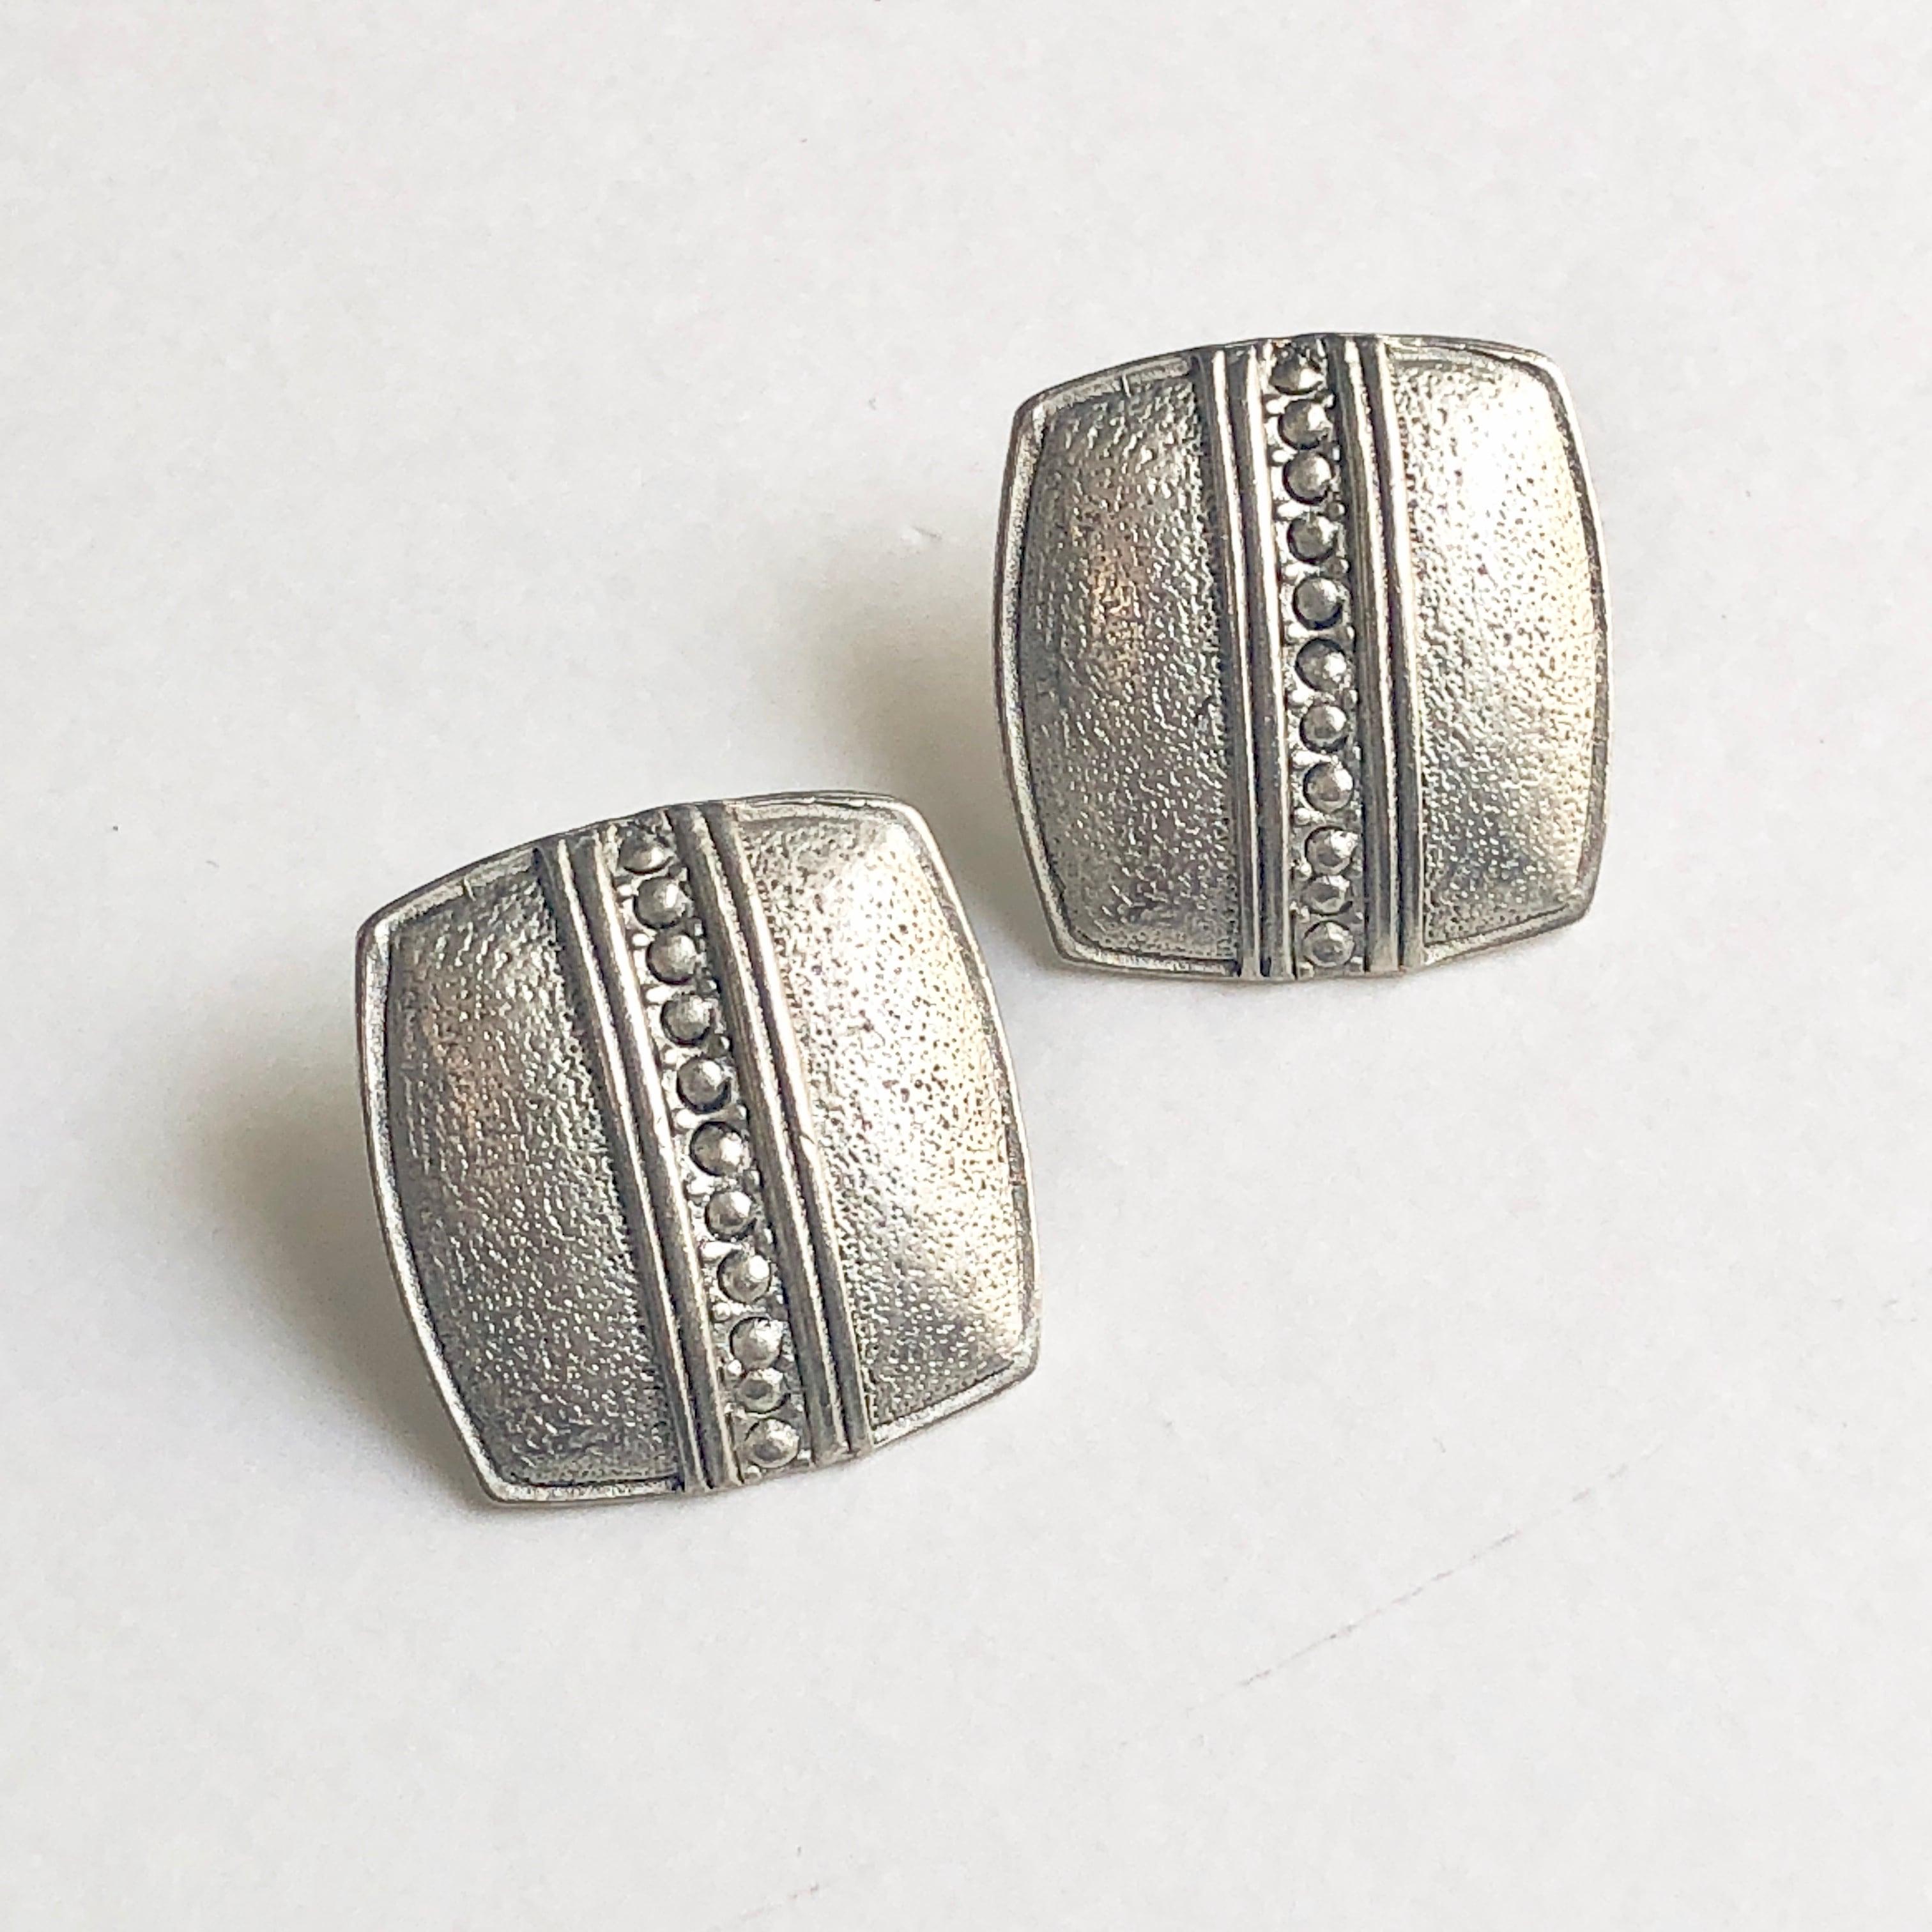 Vintage new stock earrings S-003x